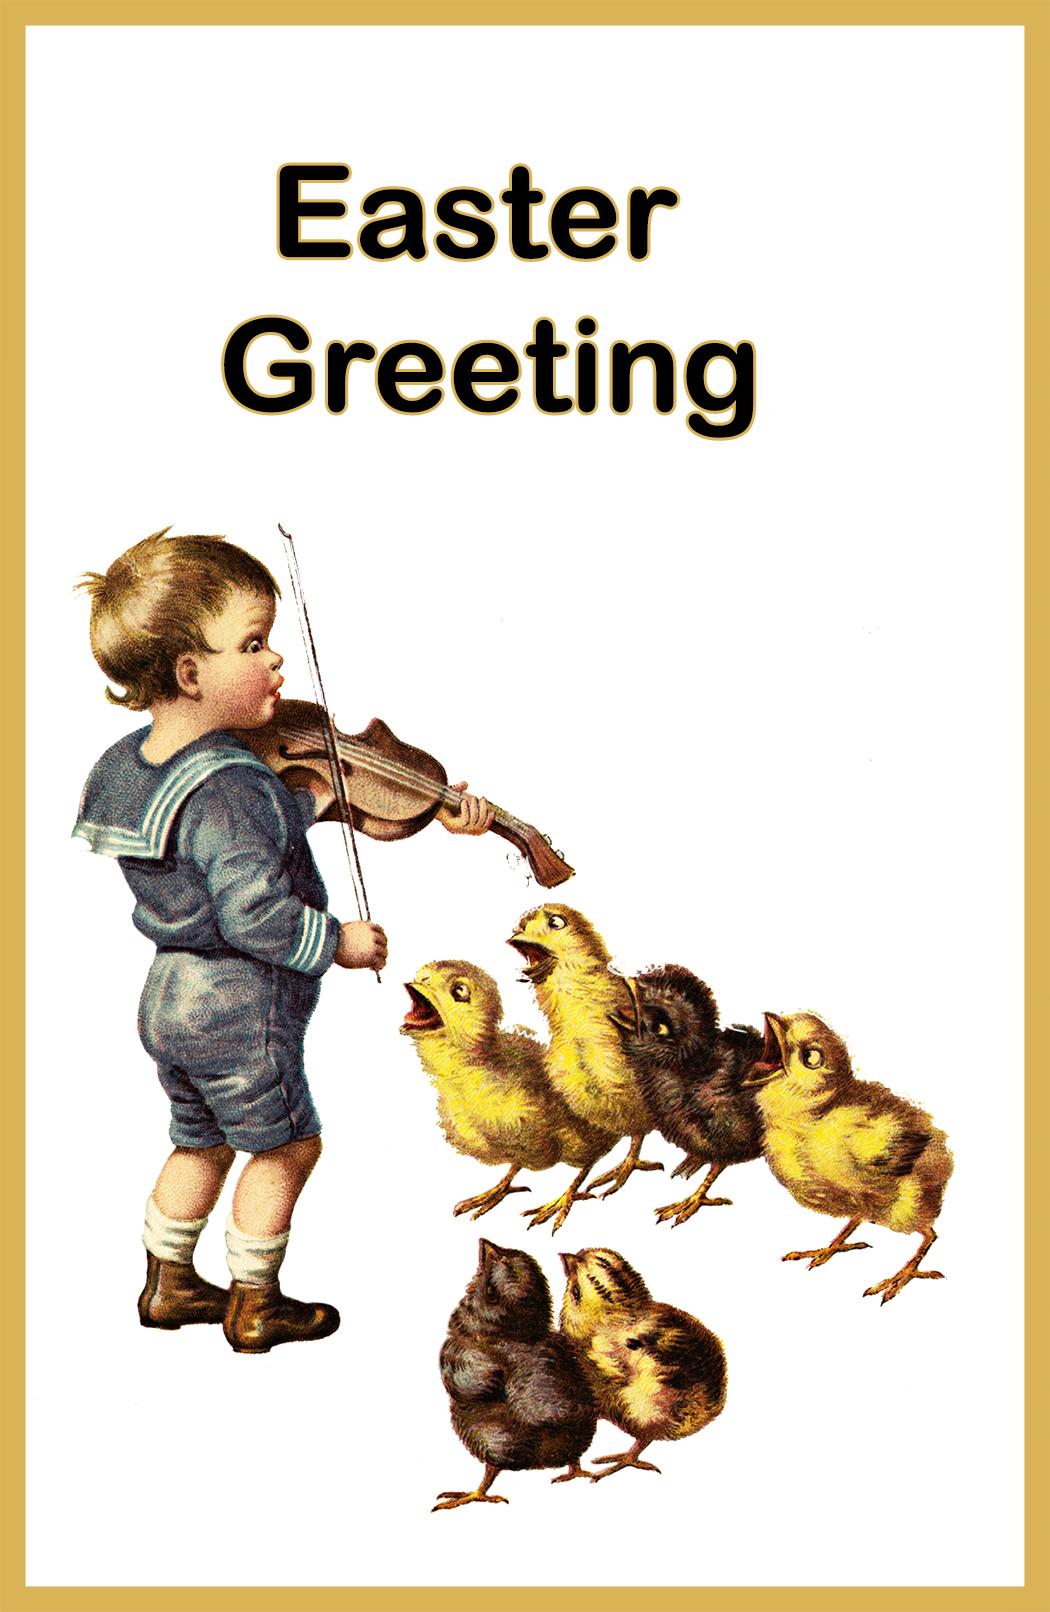 Free easter cards free printable greeting cards easter egg hunt card funny easter greeting card kristyandbryce Gallery